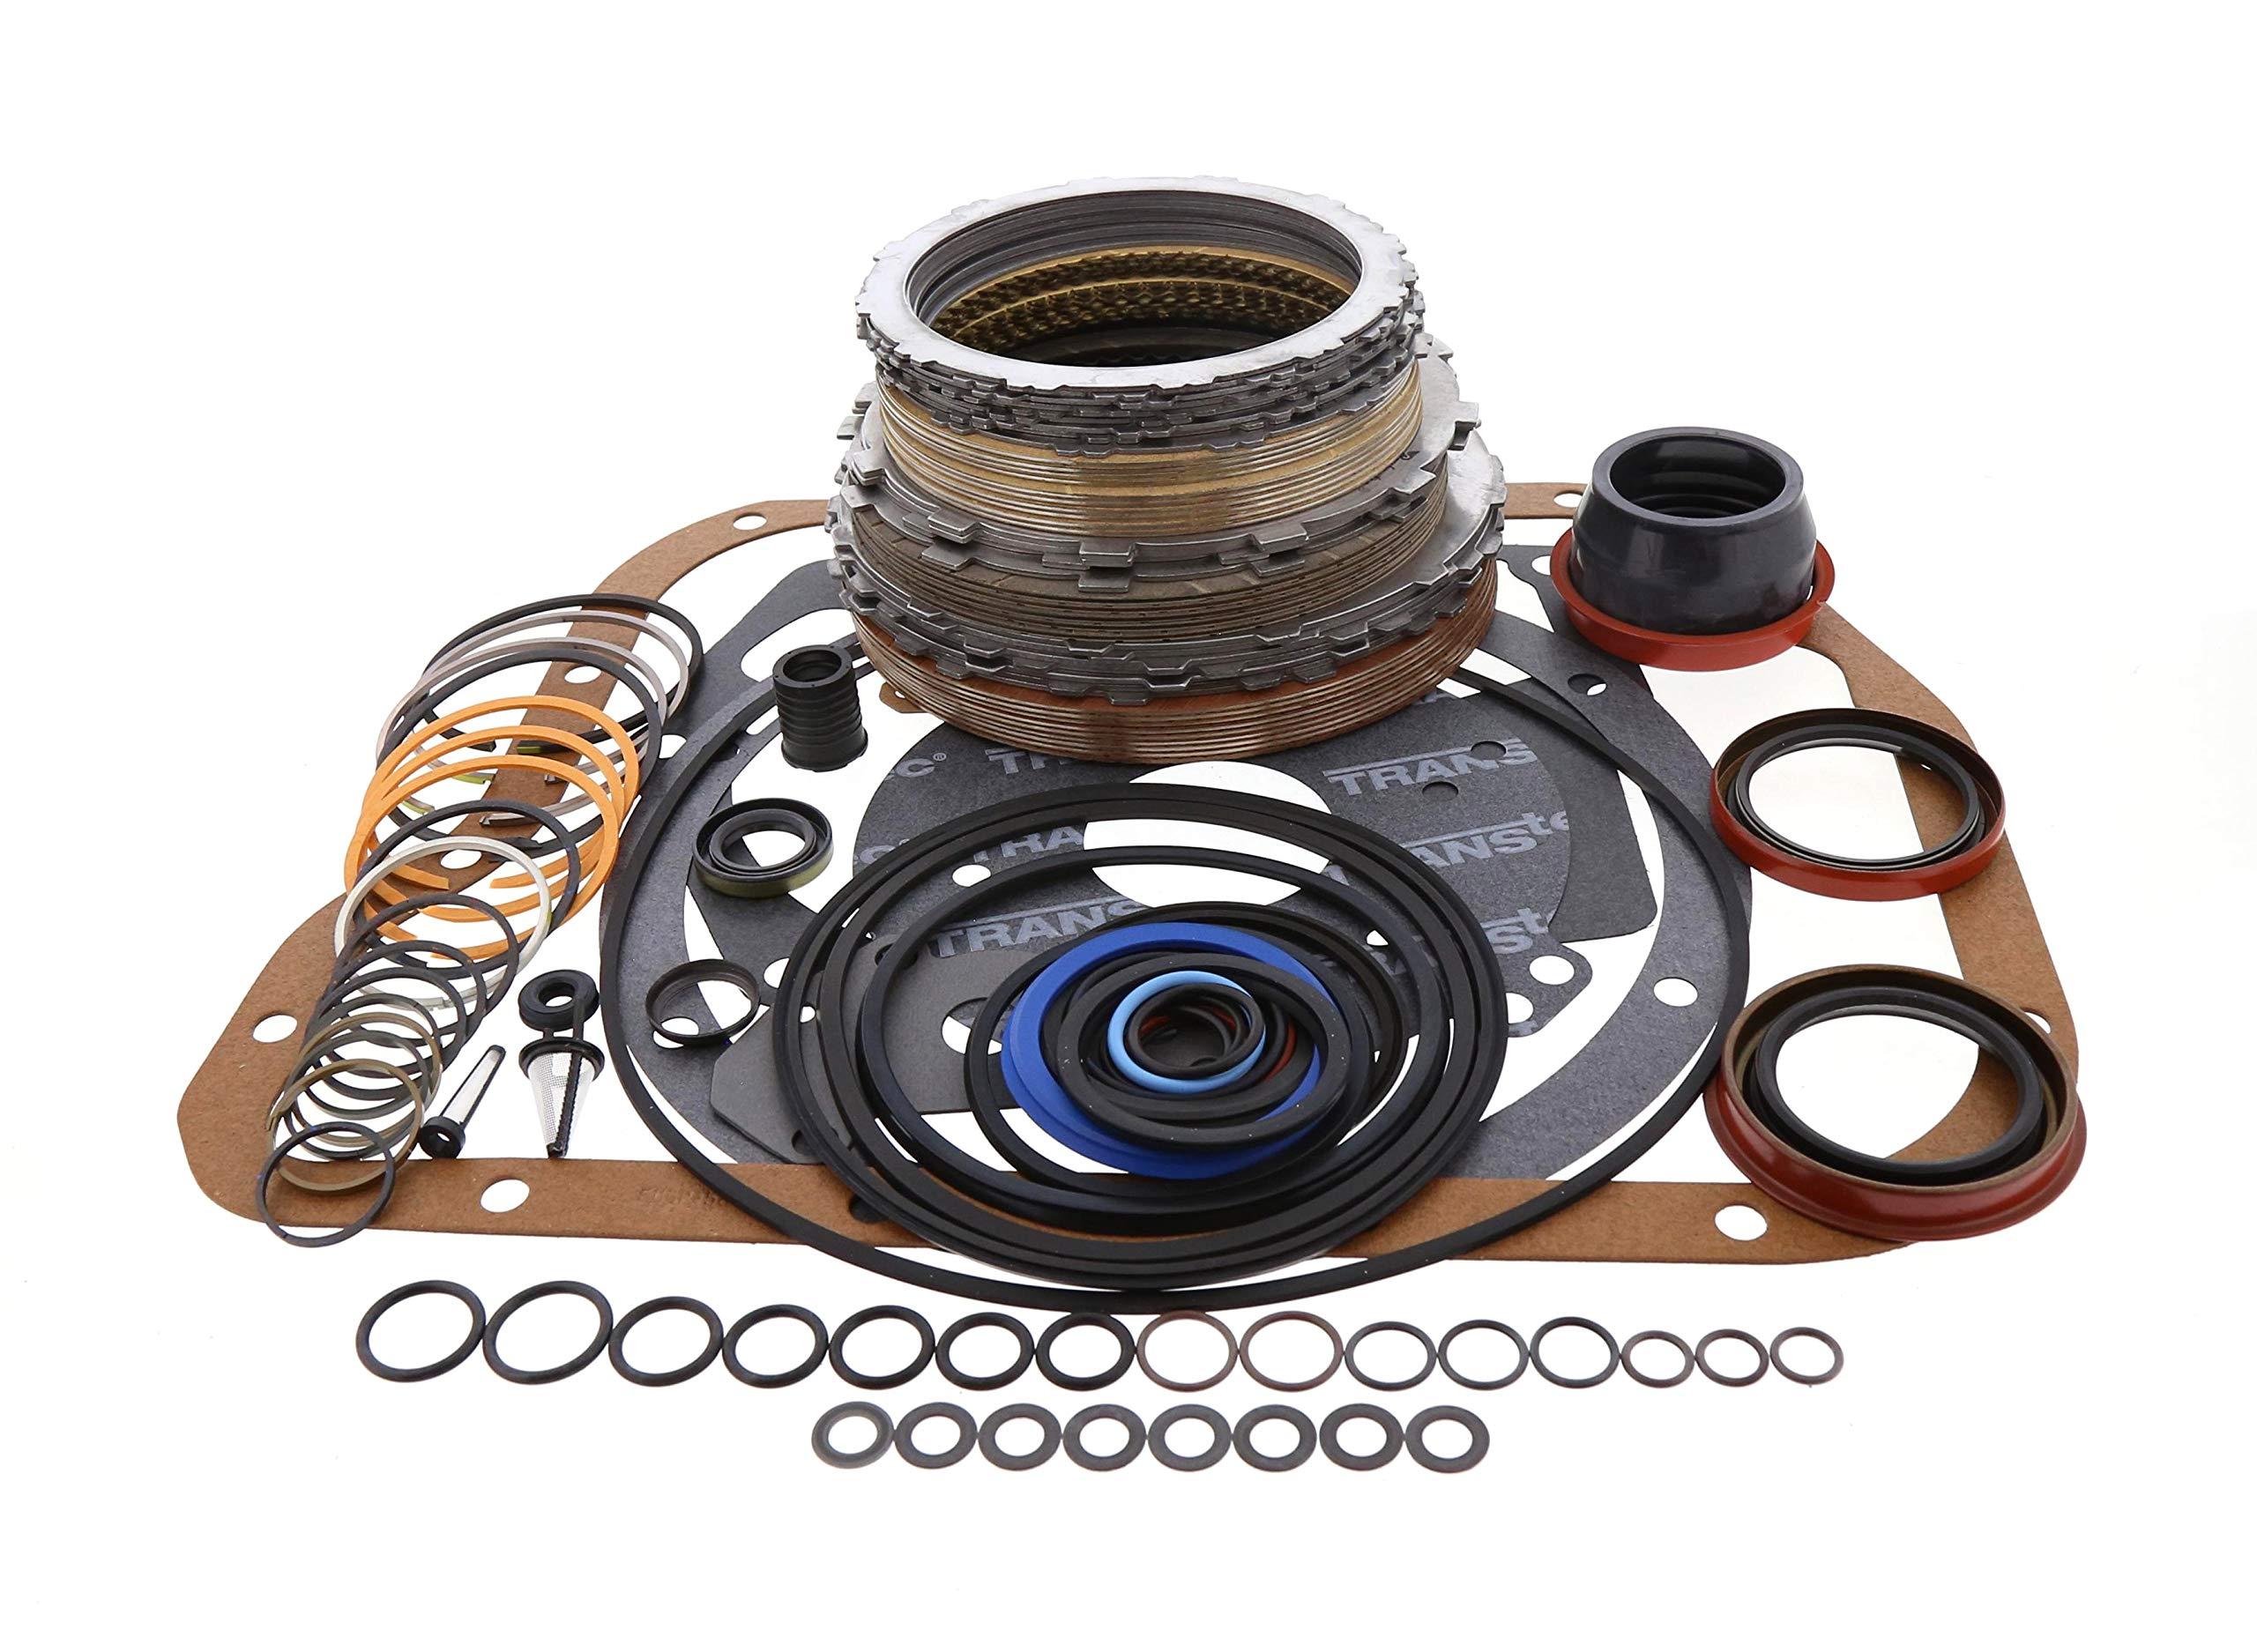 A518 46RE 47RE 46RH Raybestos Performance Transmission Rebuild Kit 1990-97 Gas